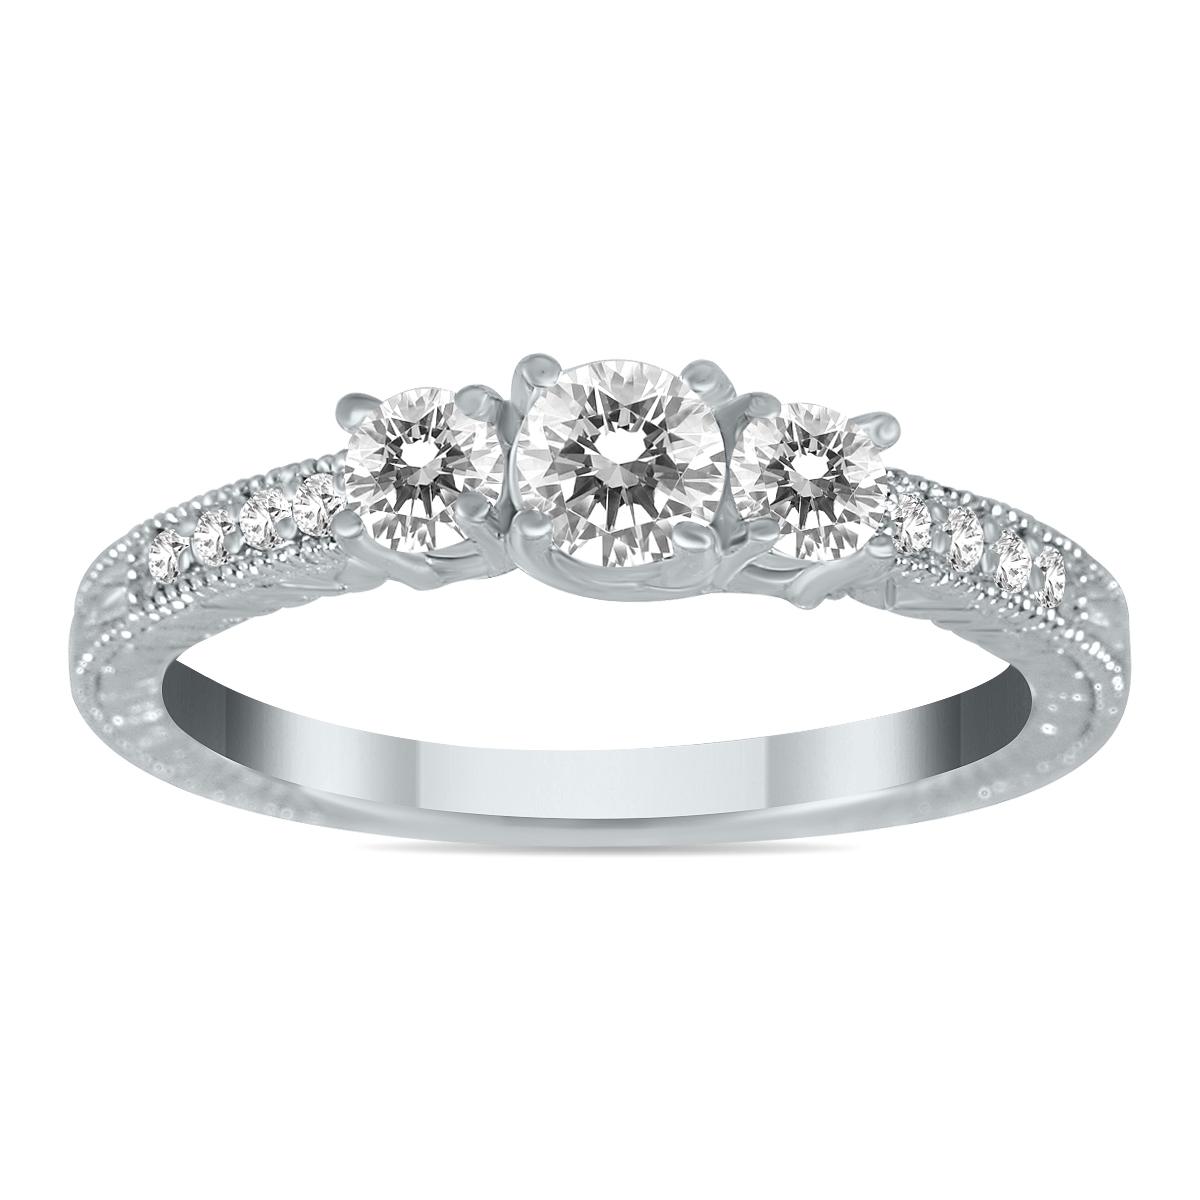 1/2 Carat TW Diamond Three Stone Ring